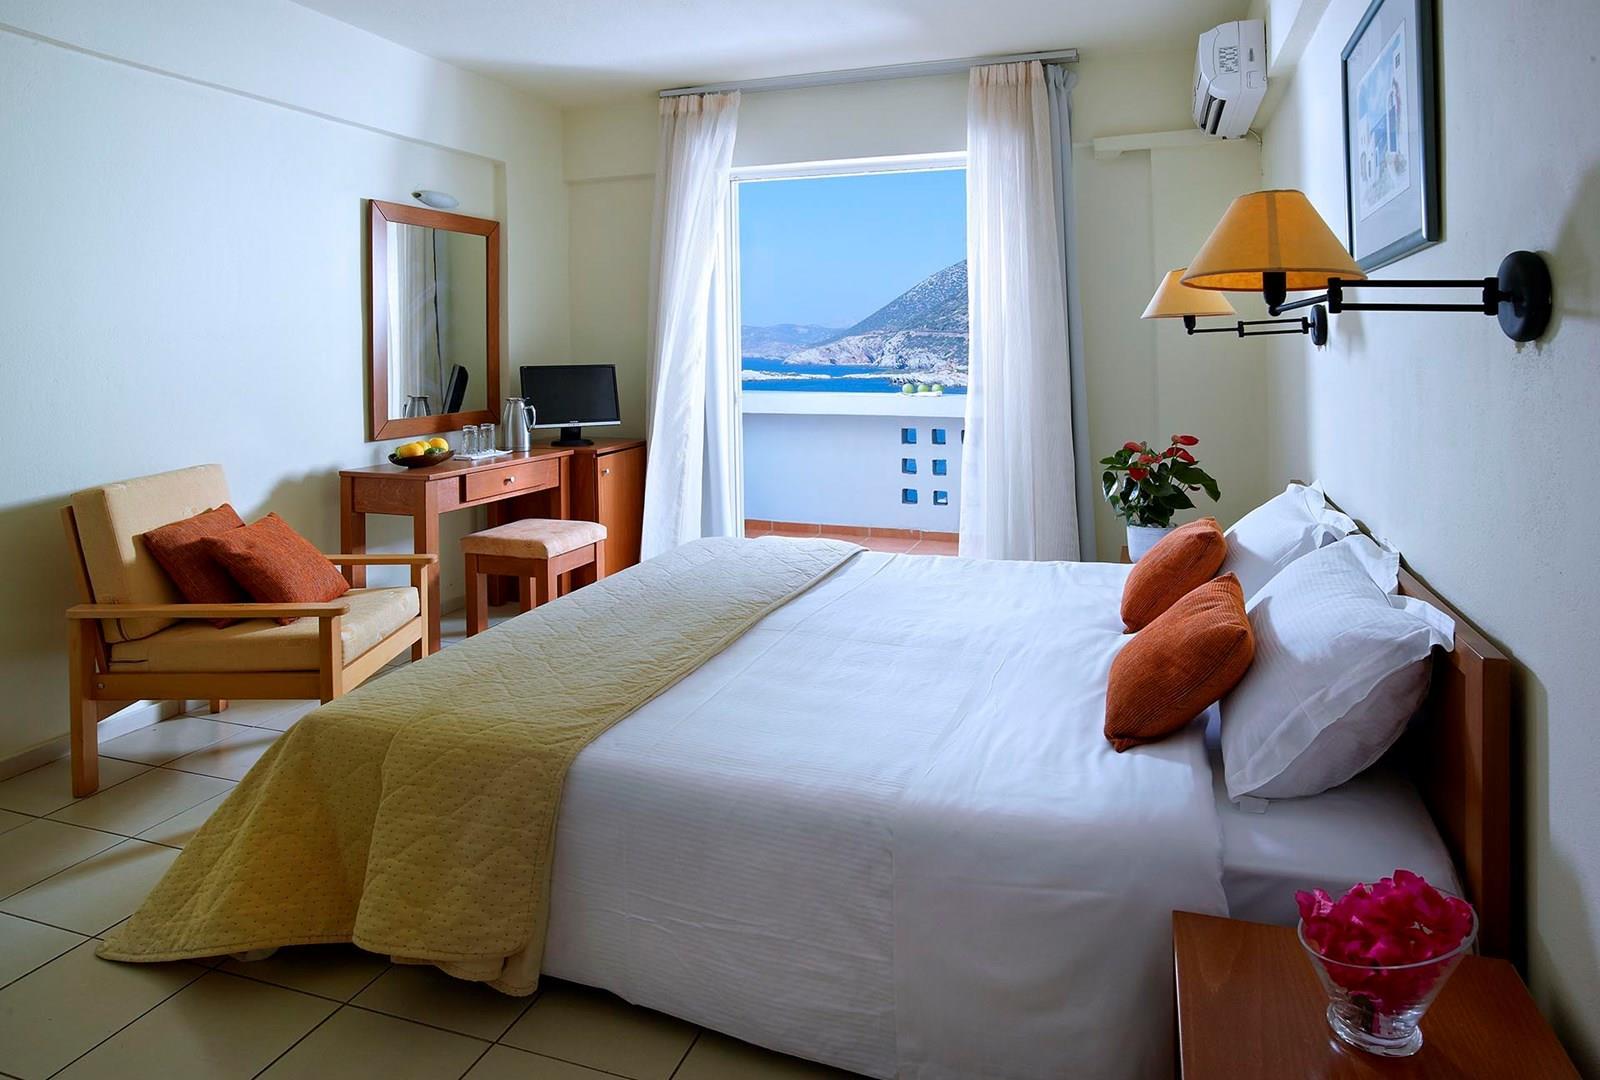 bali beach village hotel bali heraklion all inclusive. Black Bedroom Furniture Sets. Home Design Ideas